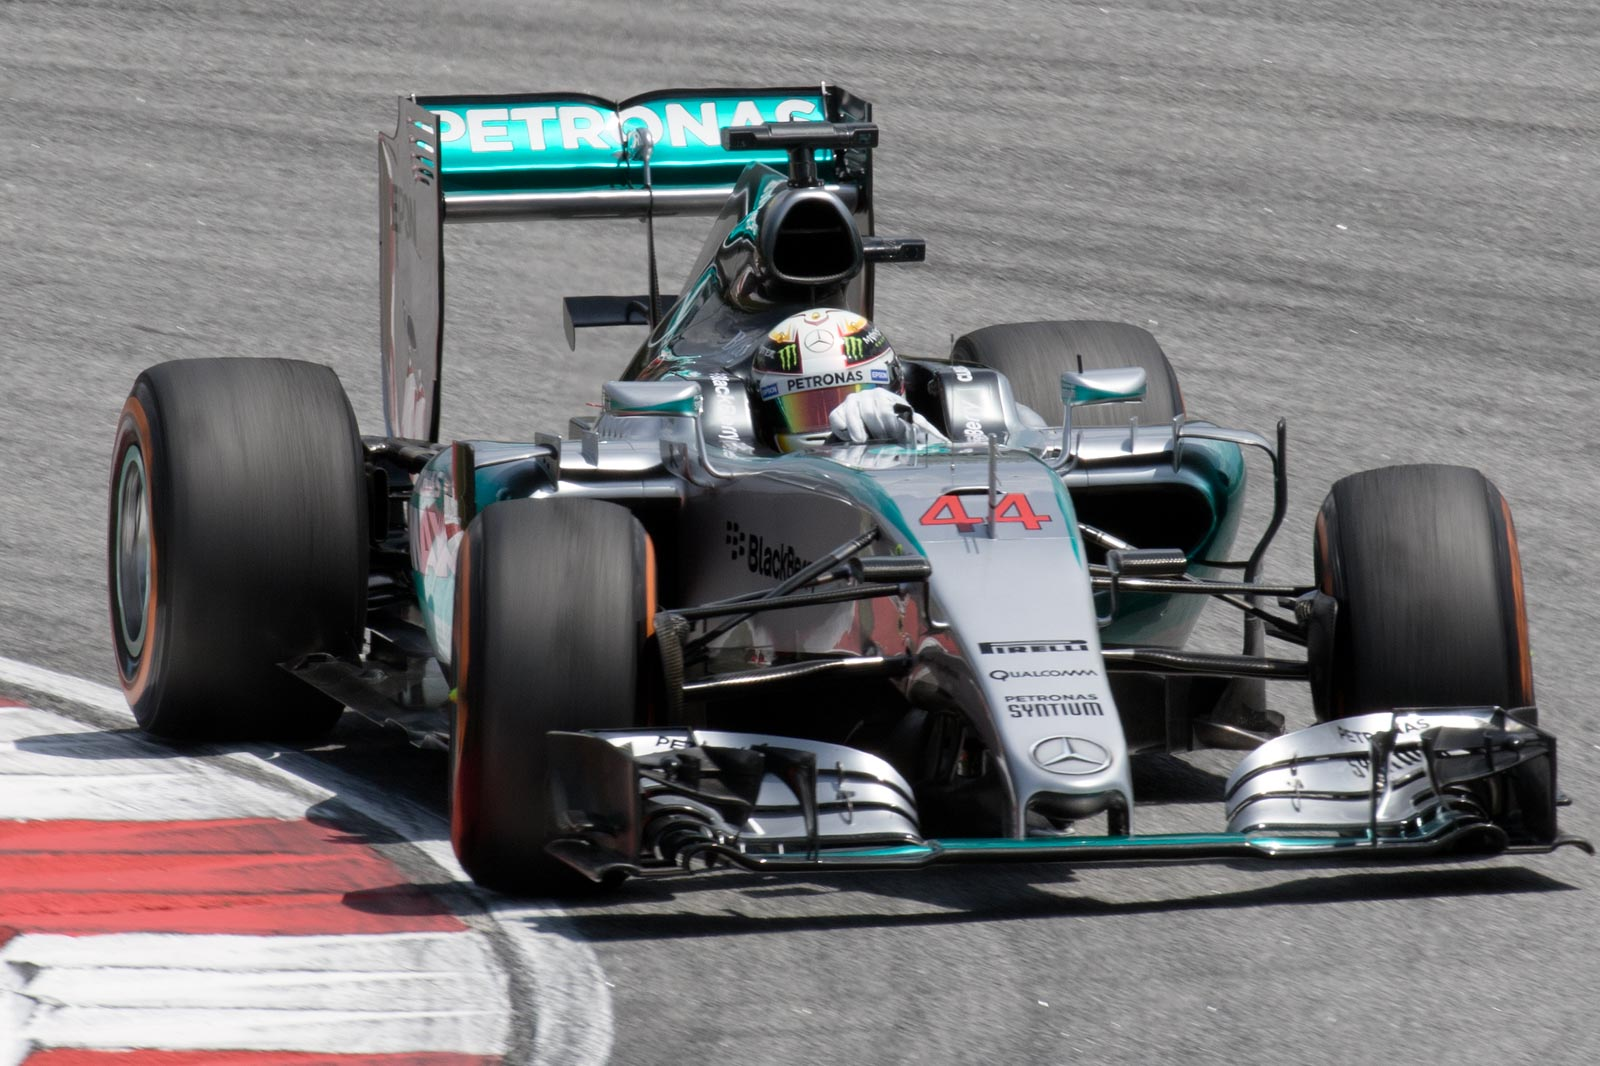 Lewis_Hamilton_2015_Malaysia_FP3_1.jpg